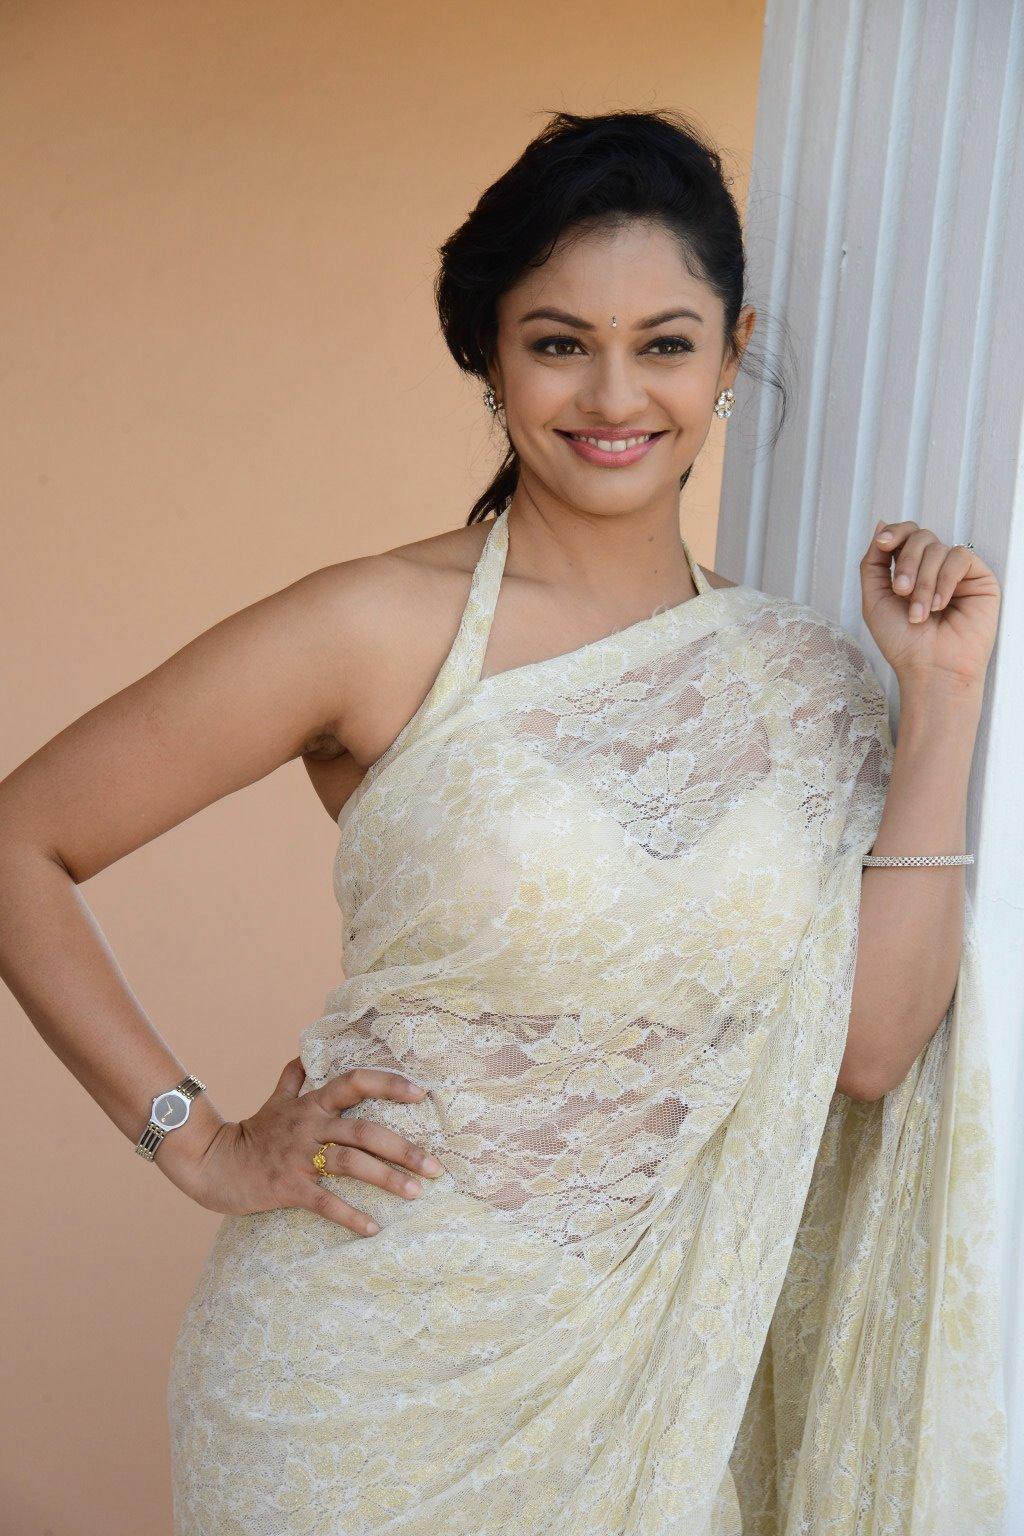 Pooja Kumar Garuda Vega Promotion Stills - Latest Movie Updates, Movie Promotions, Branding -2152